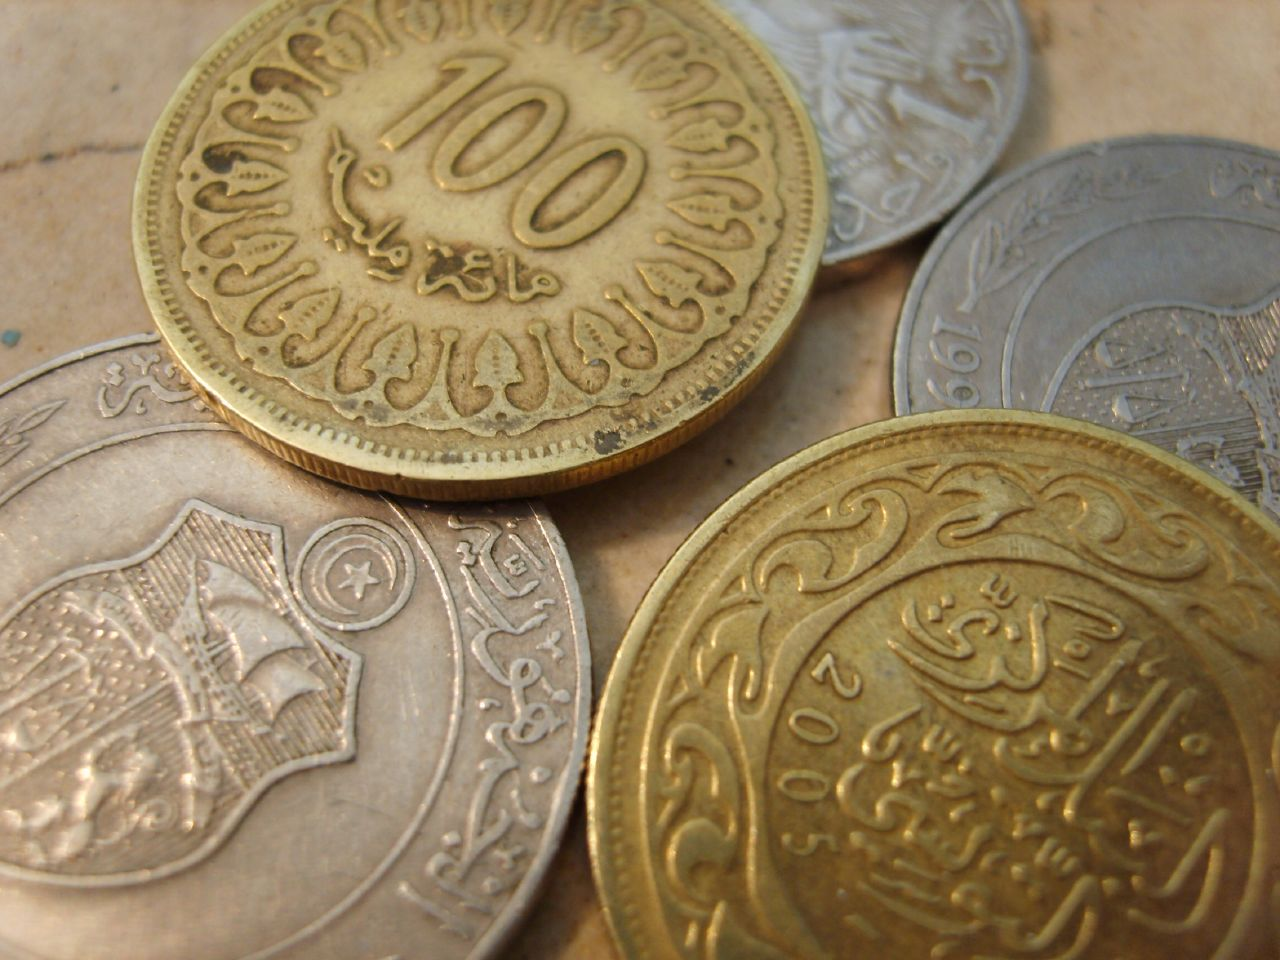 dinars in iraq revalue